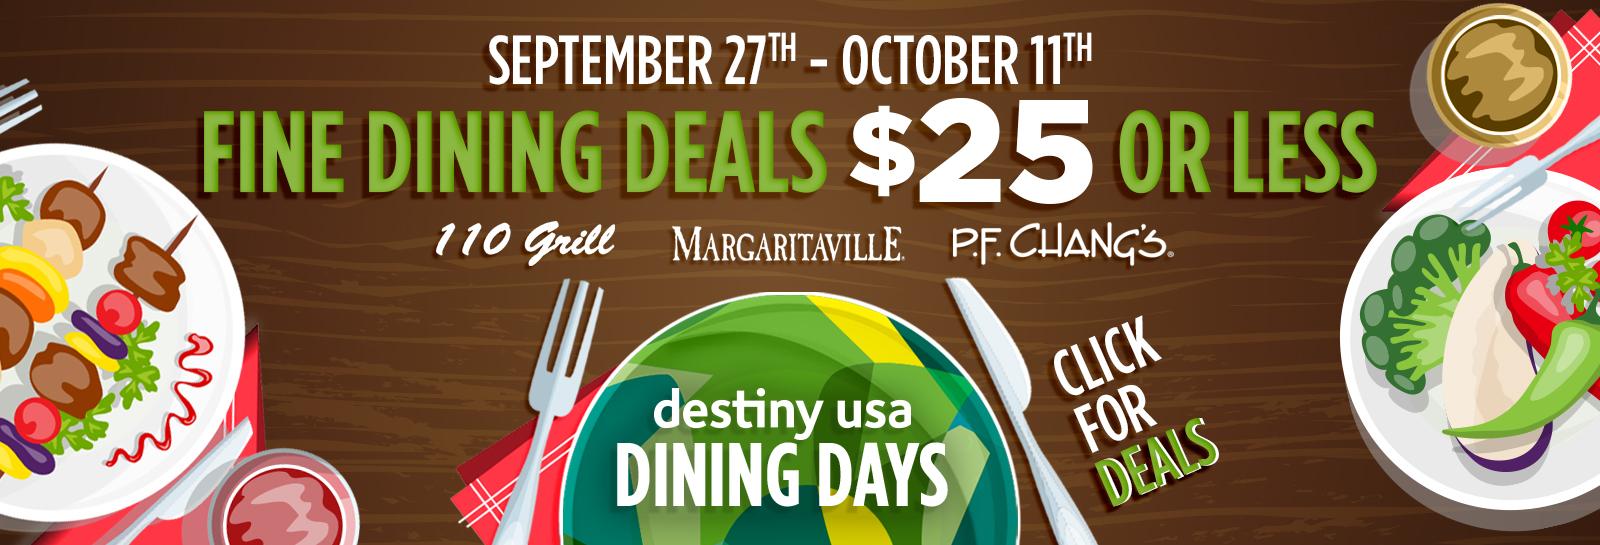 2020 09 22 dining days slider